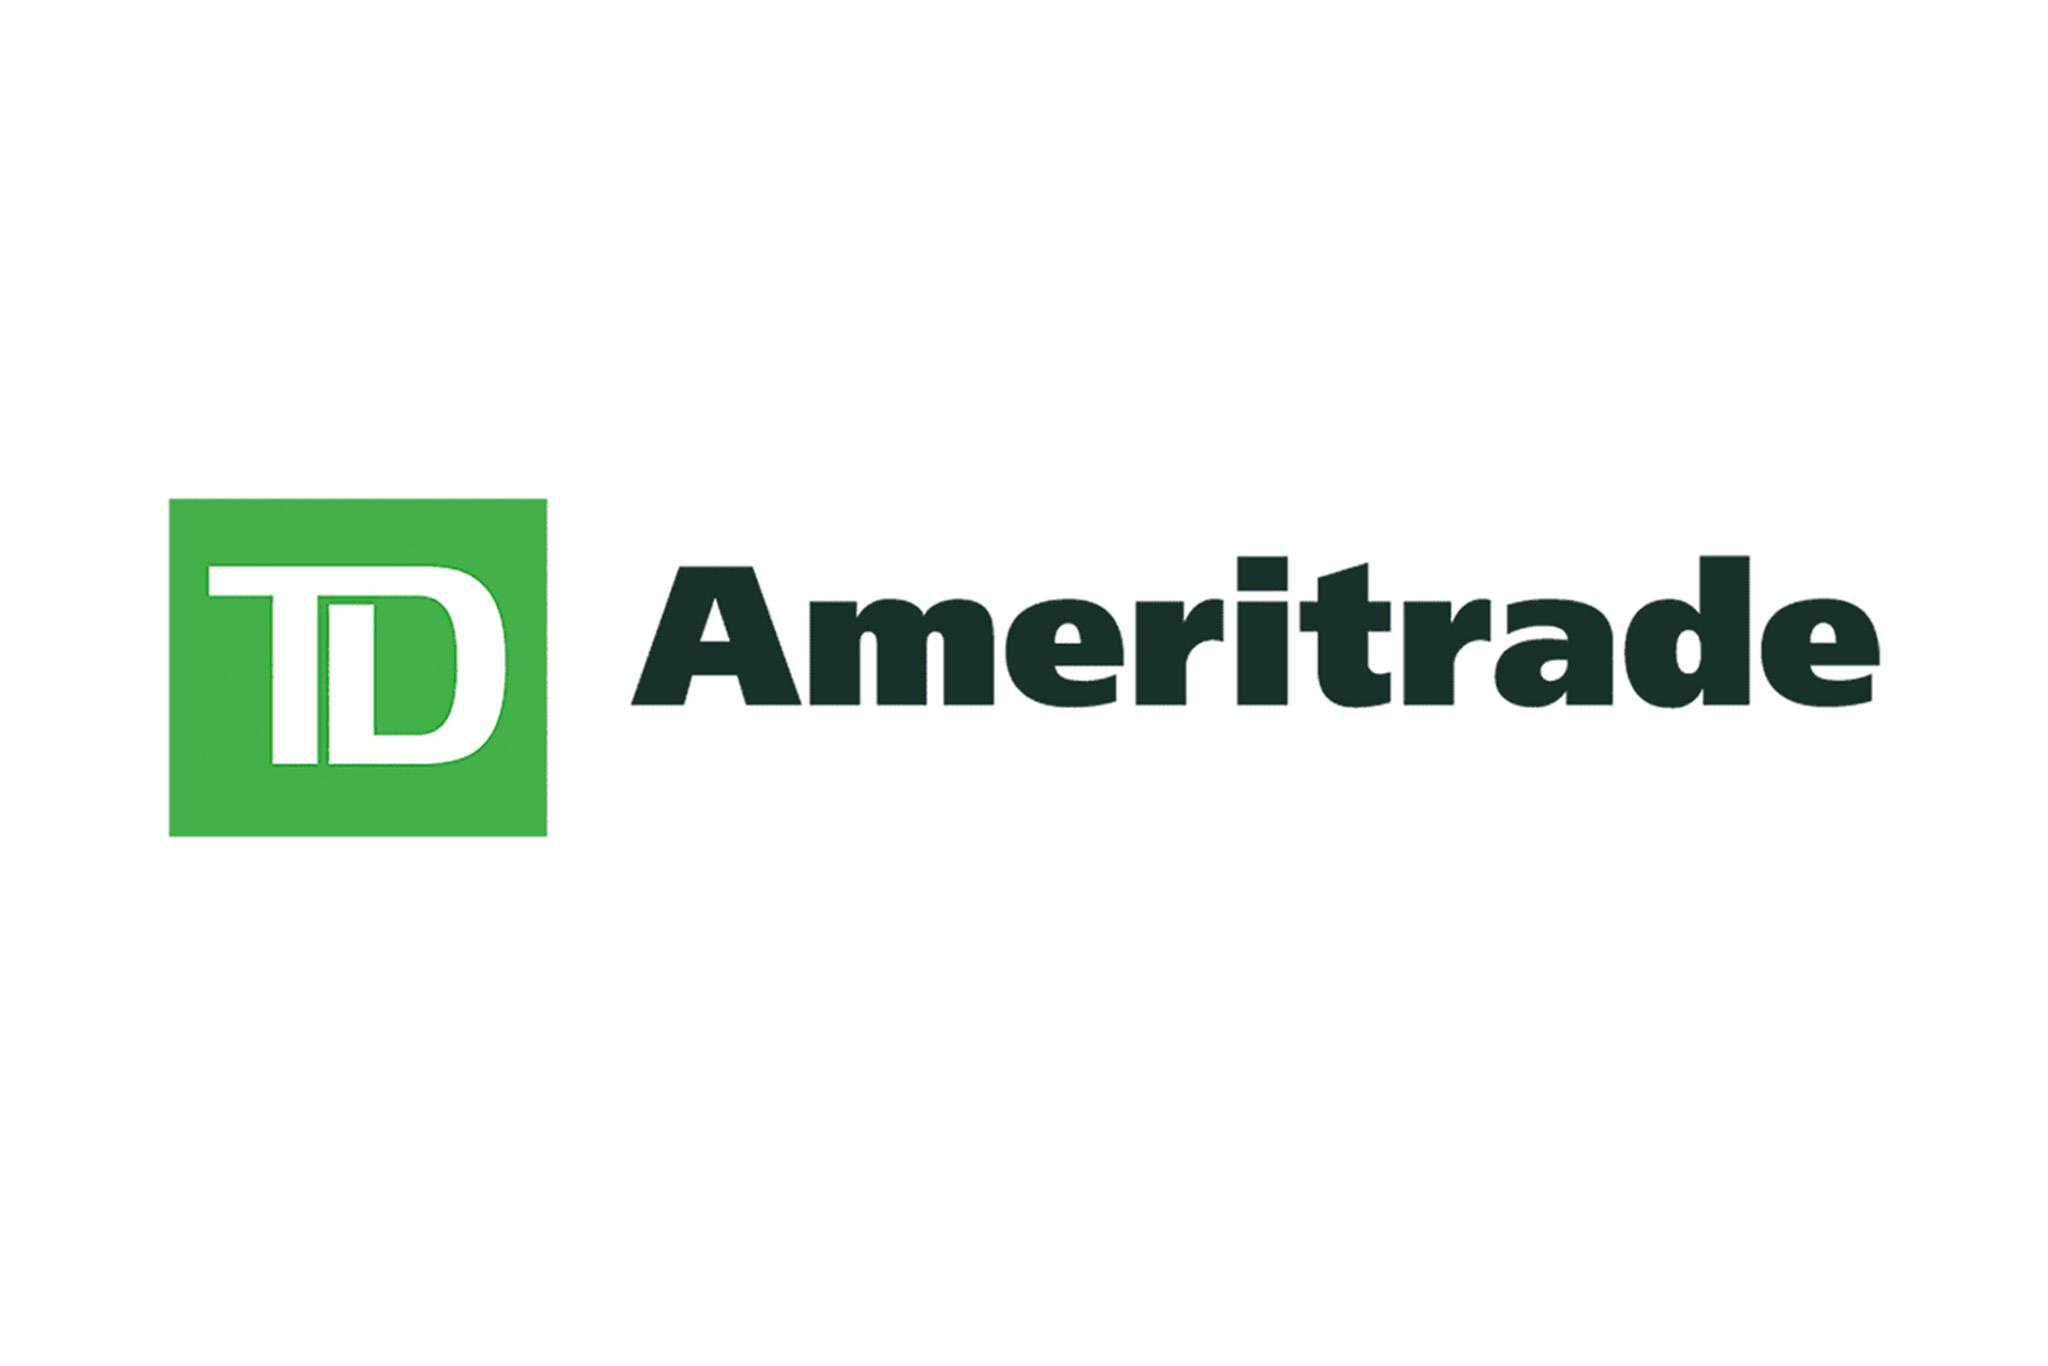 https://www.financialstaples.com/wp-content/uploads/2020/08/Financial-Staples-TD-Ameritrade.jpg